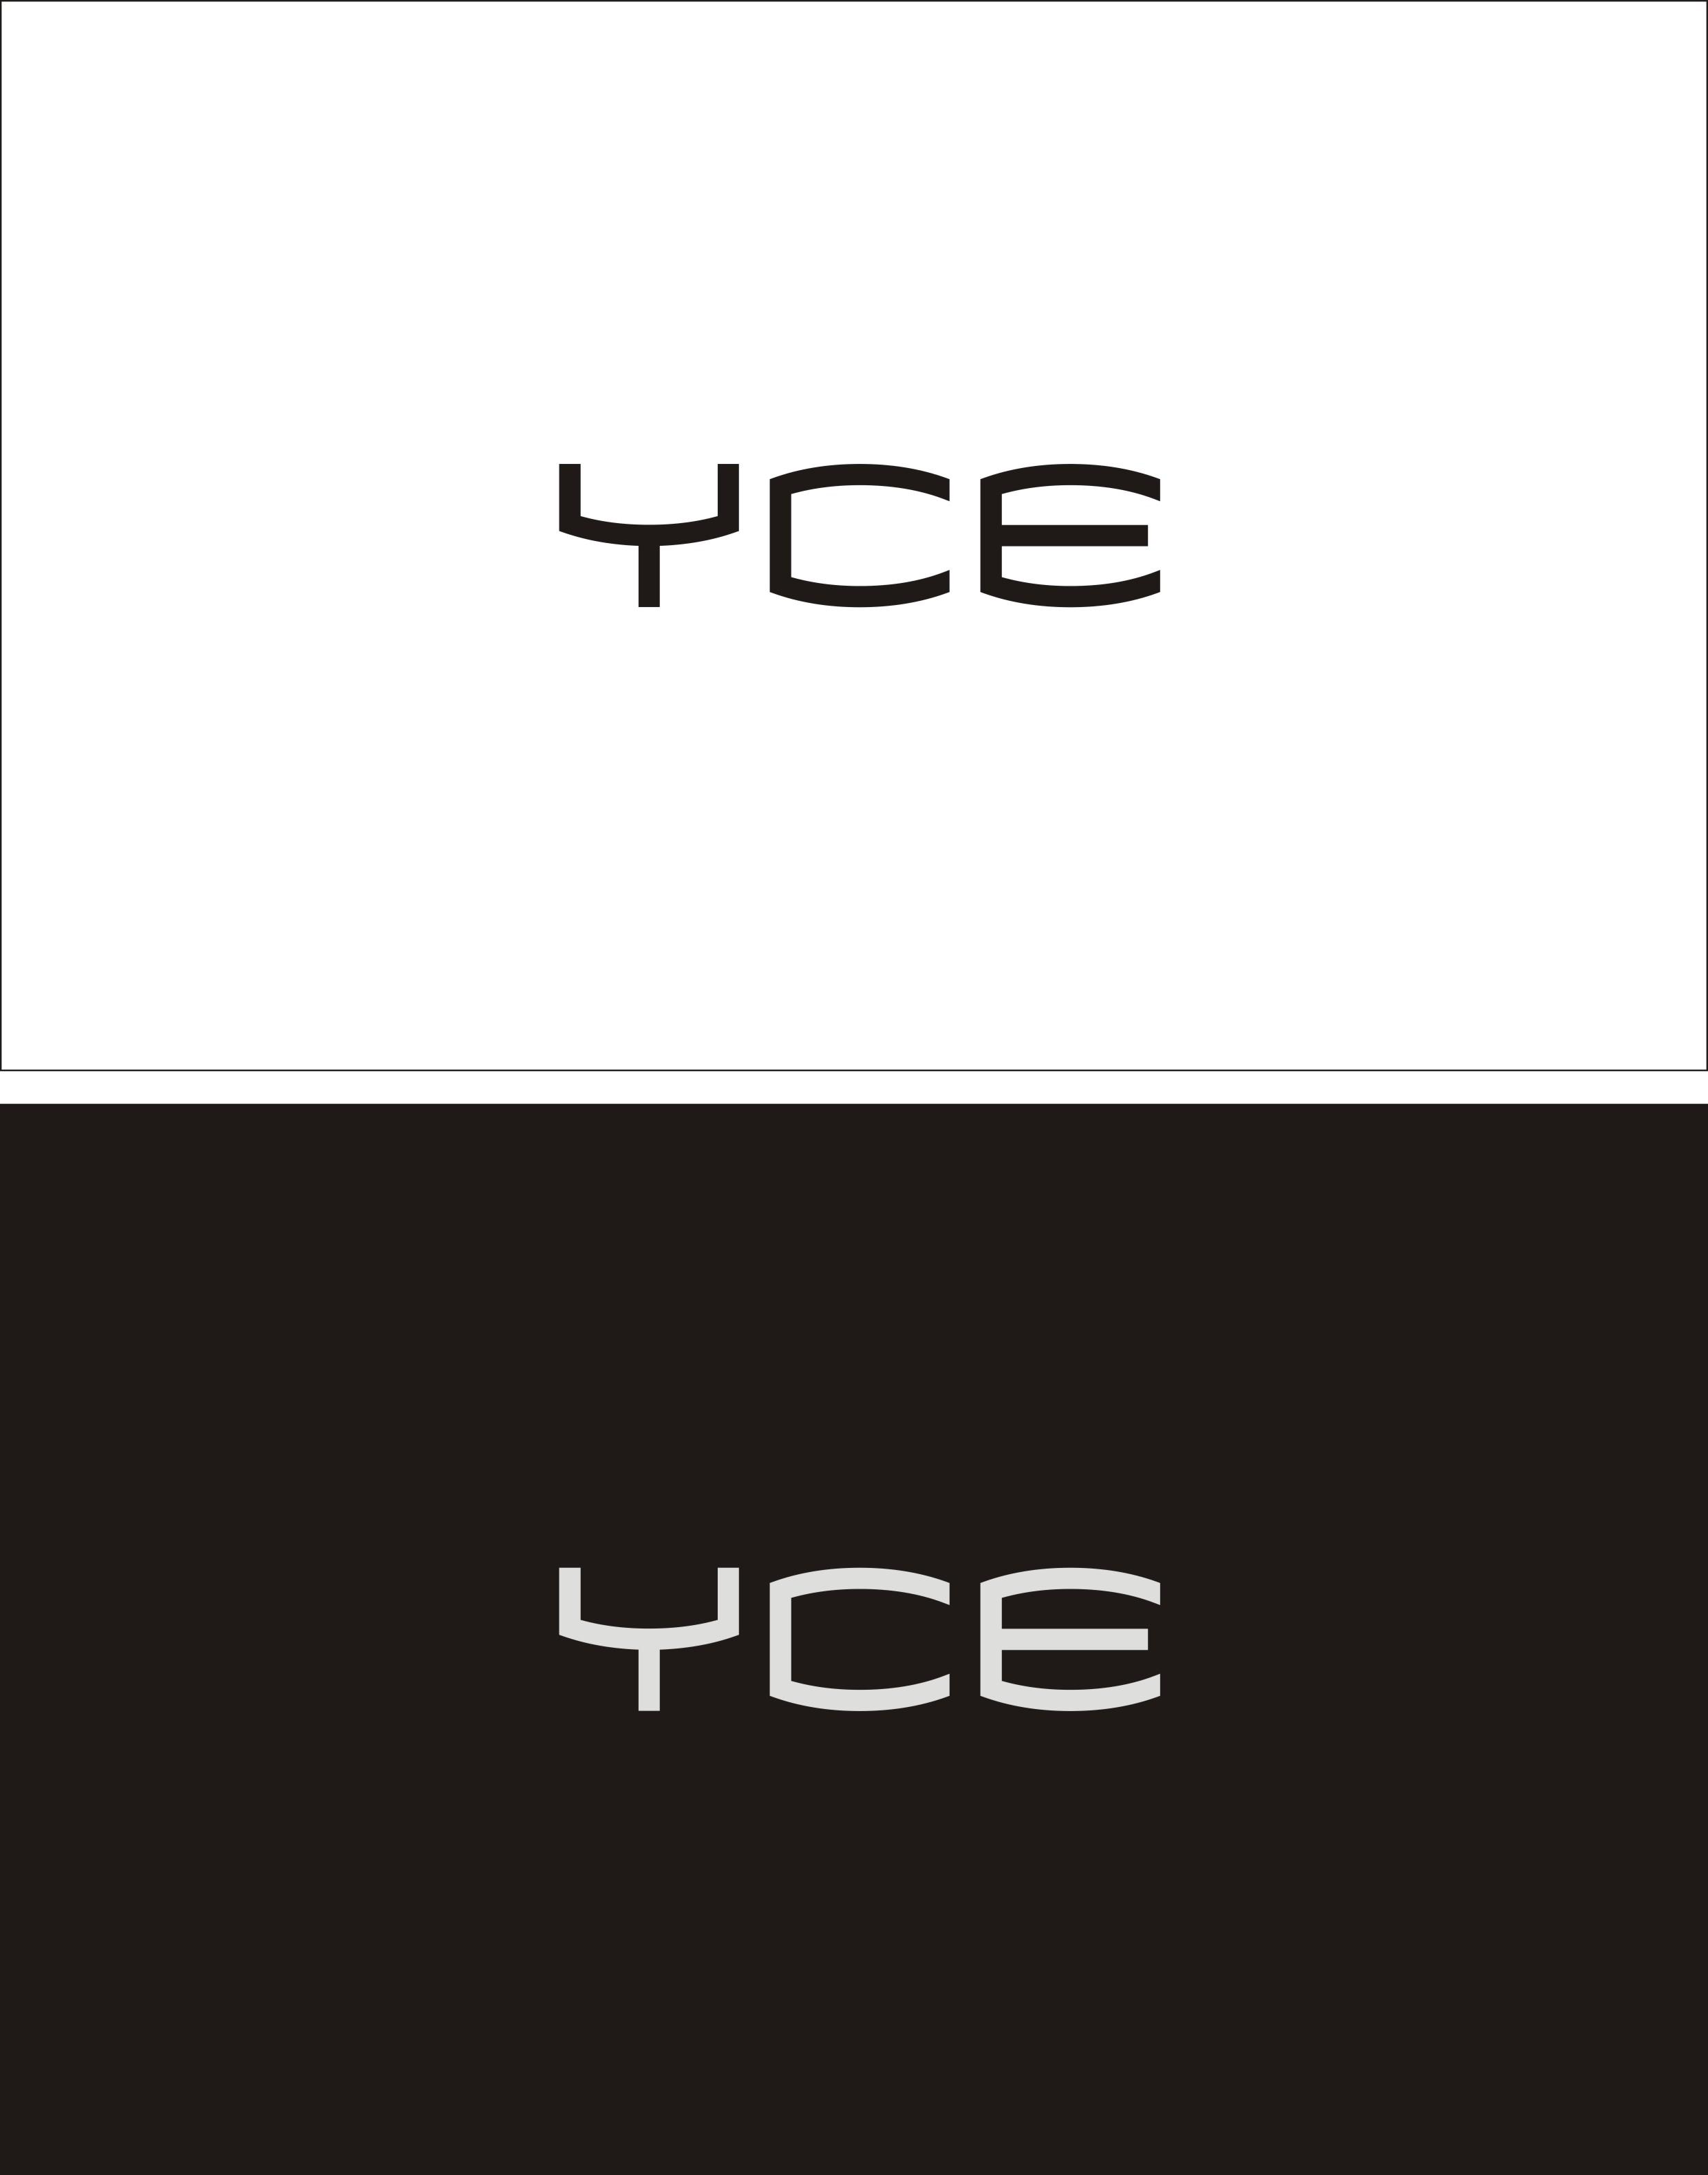 Logo优化_2951475_k68威客网